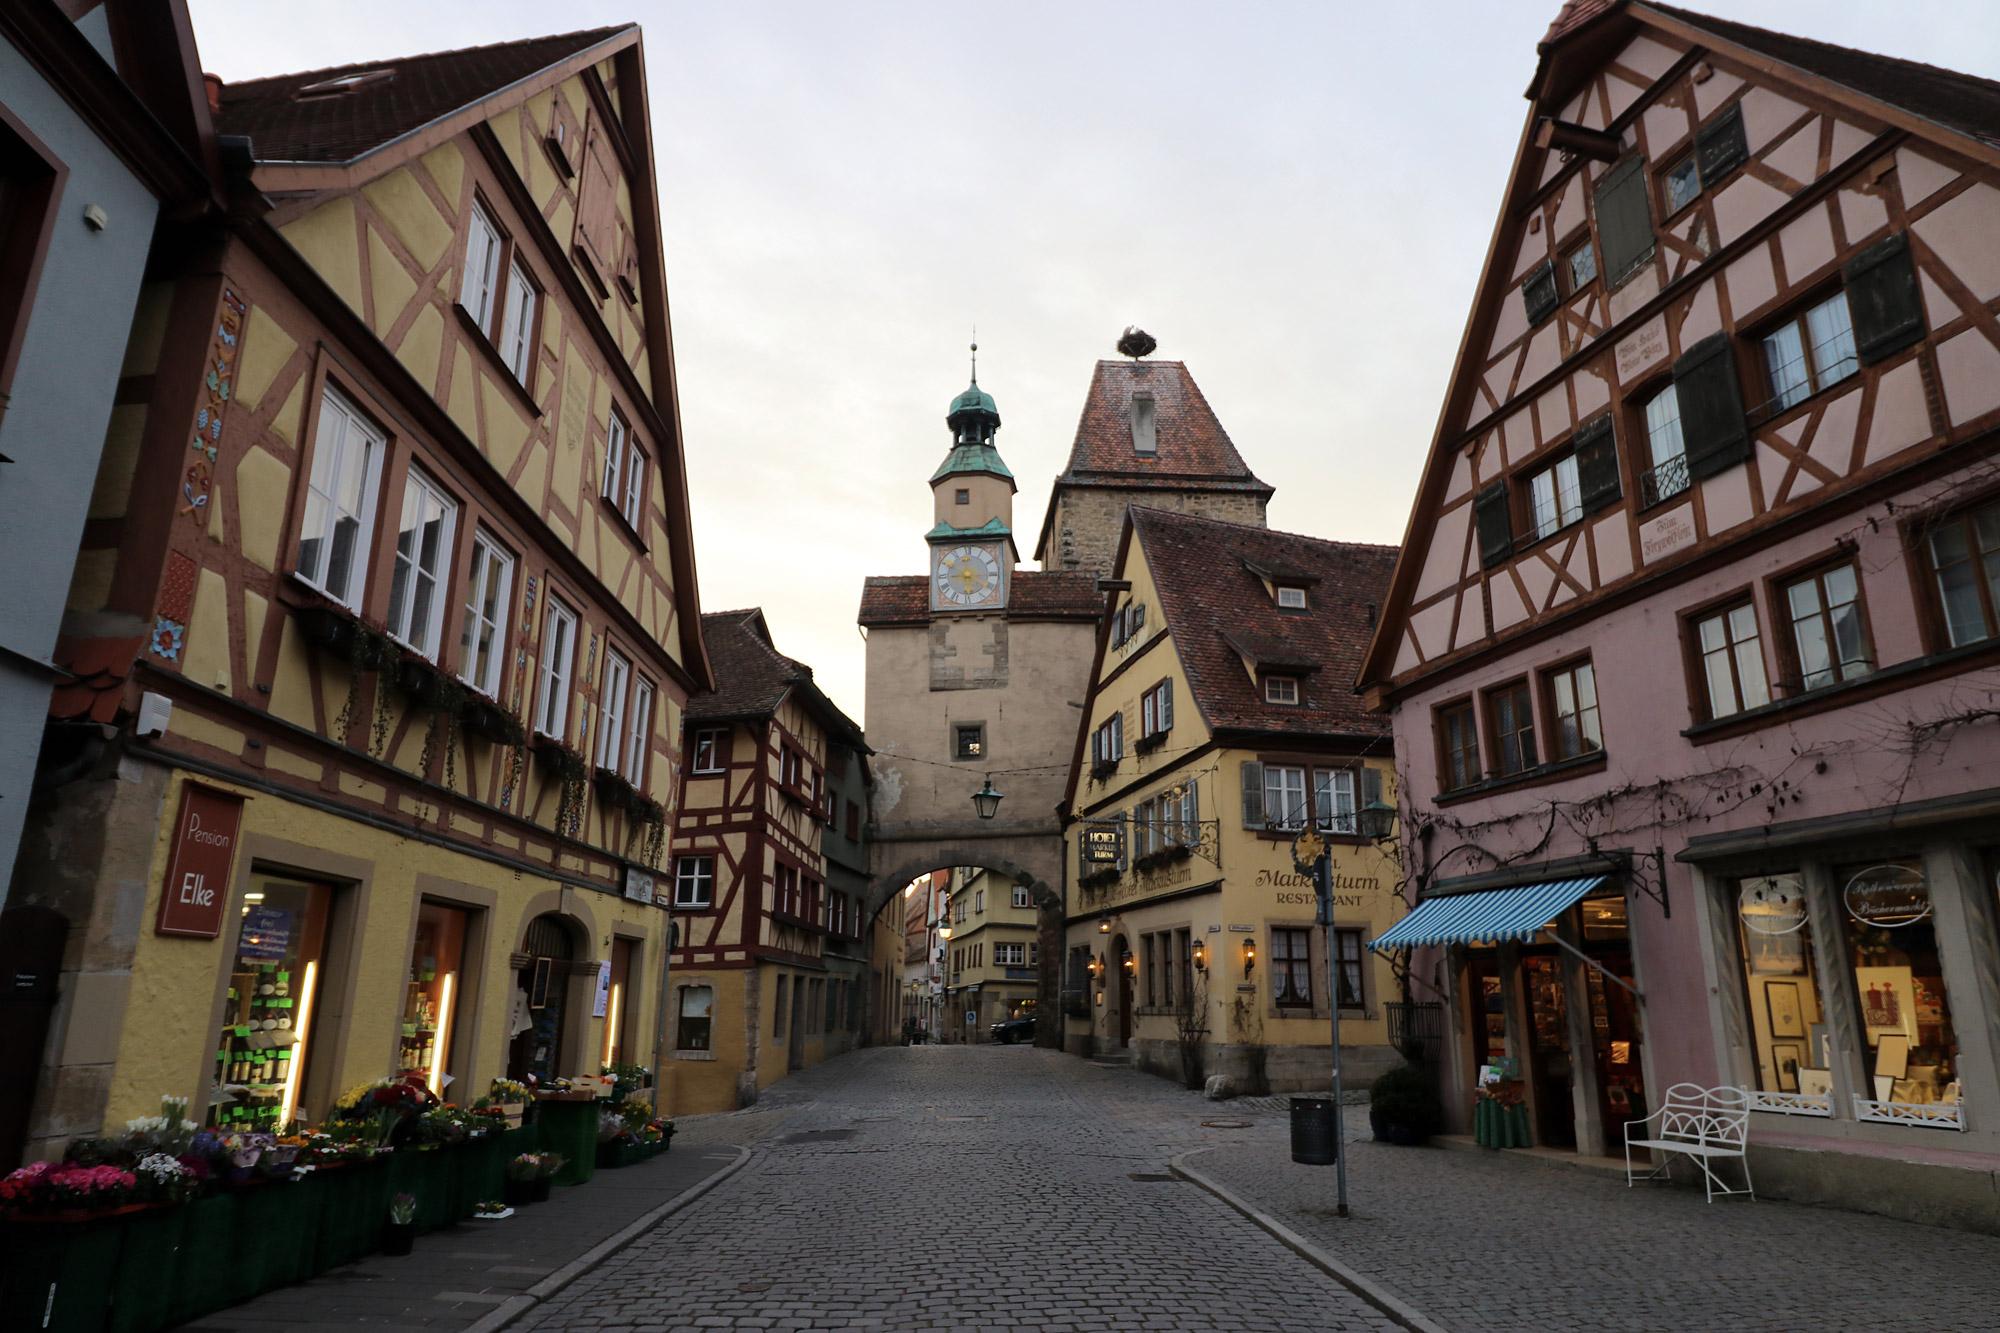 Markusturm en Röderbogenturm - Rothernburg ob der Tauber - Duitsland